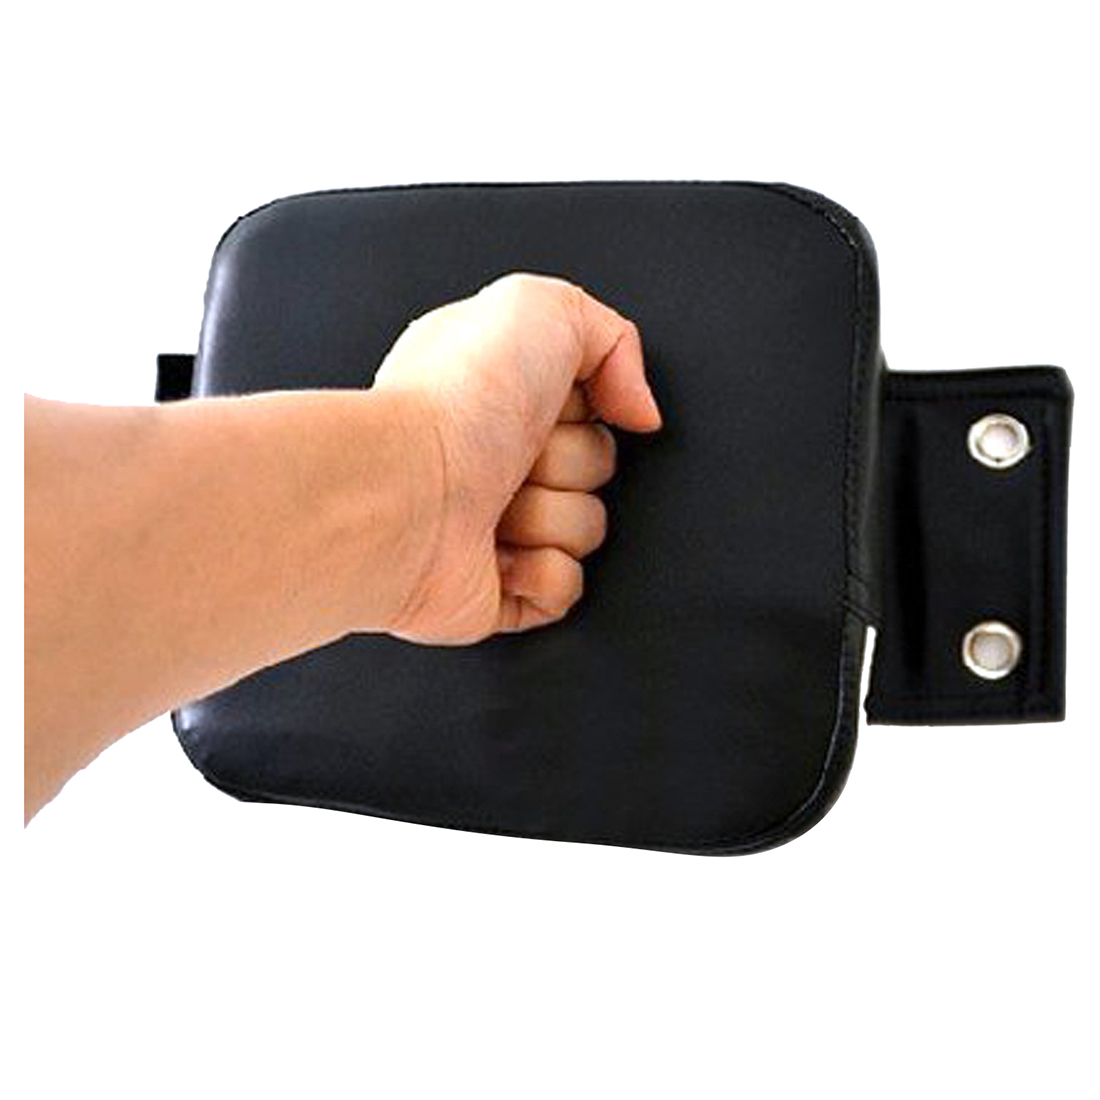 Punch Wall Focus Target Pad WING CHUN Boxing Fight Sanda Taekowndo Training Bag